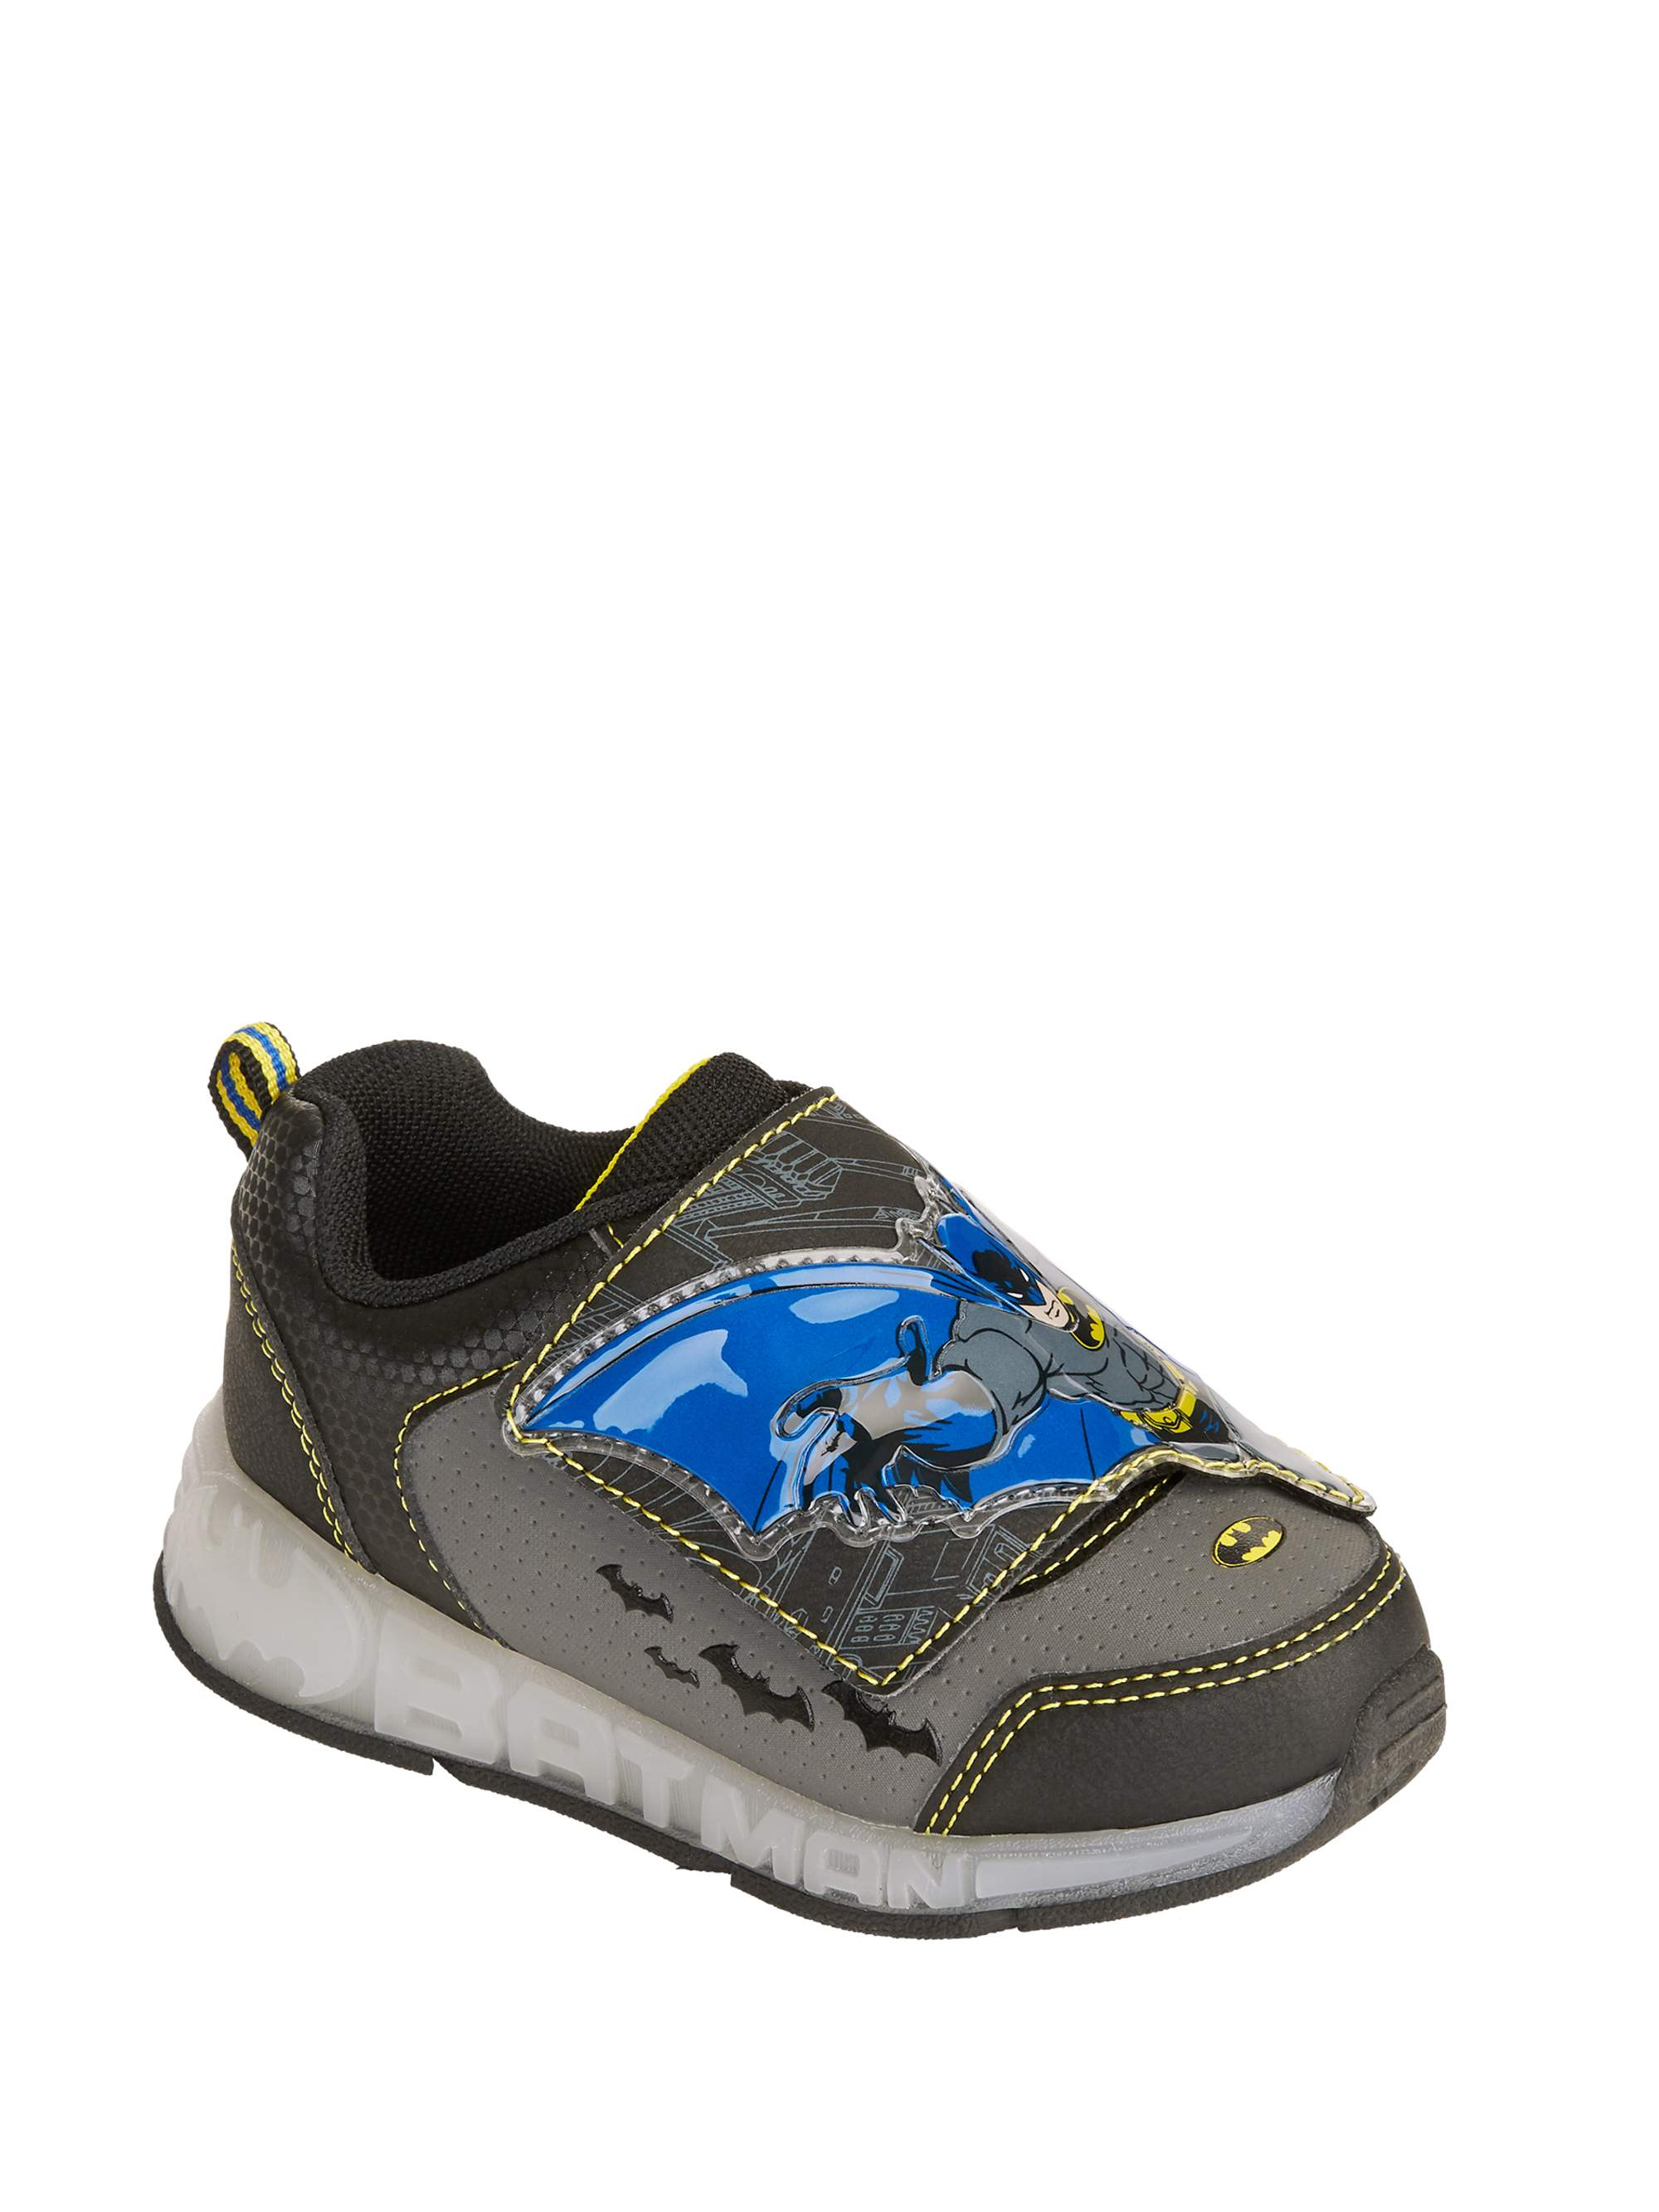 Batman Boys' Lighted Athletic Shoes